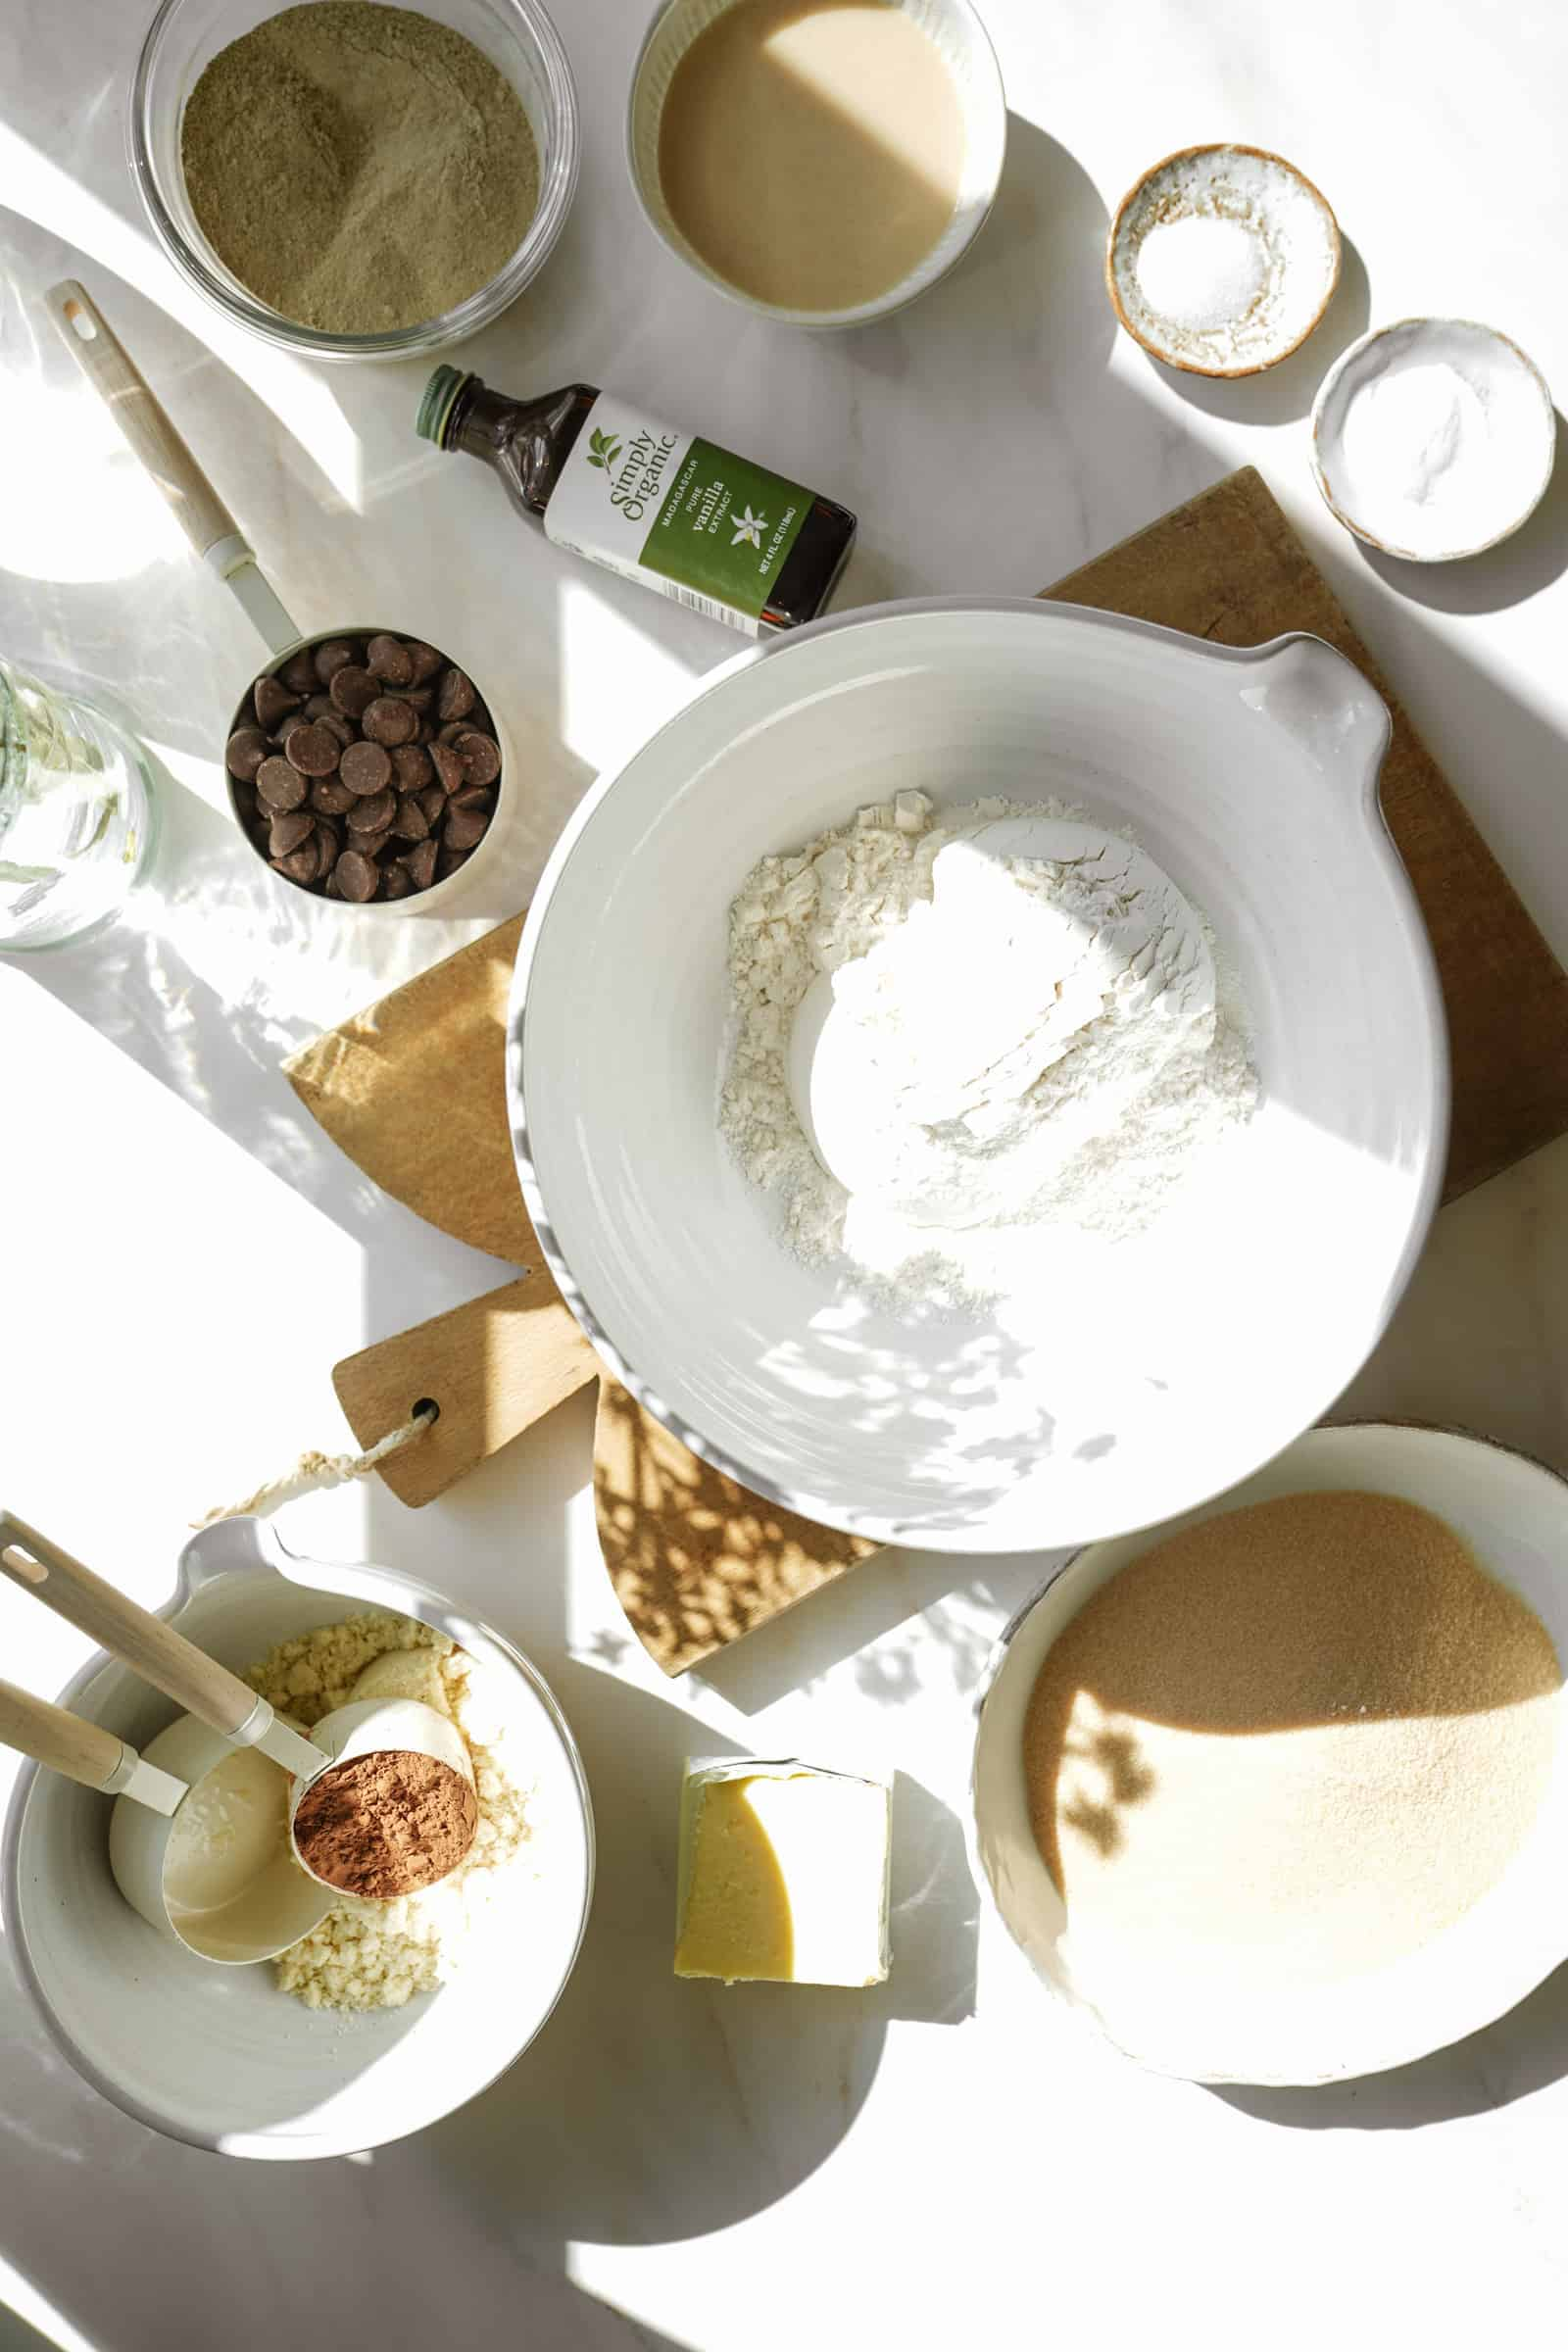 Ingredients for vegan protein cookies